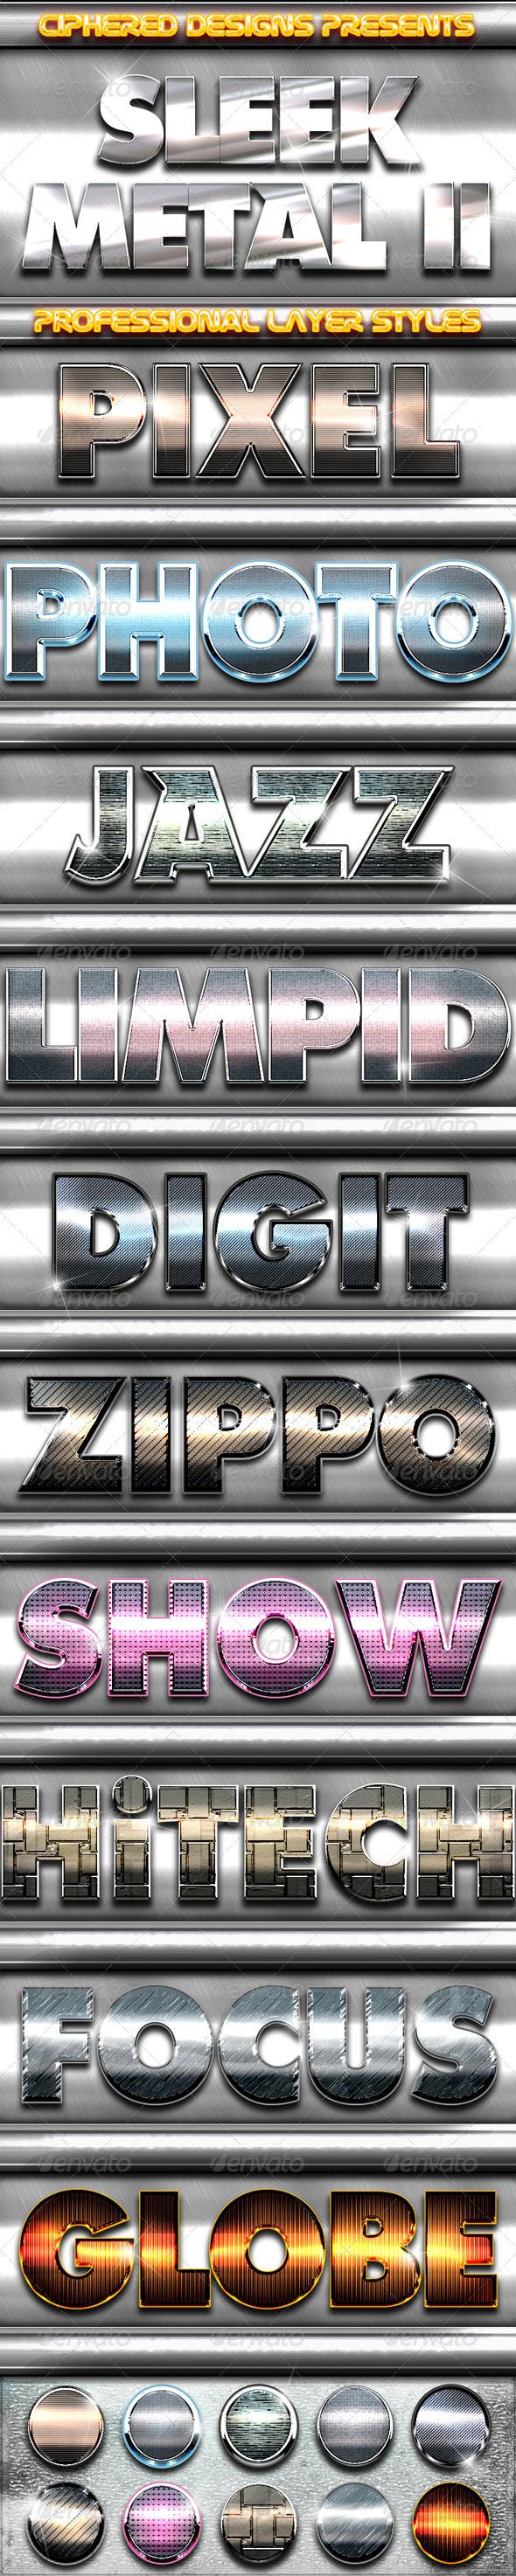 GraphicRiver Sleek Metal II Professional Layer Styles 3322164